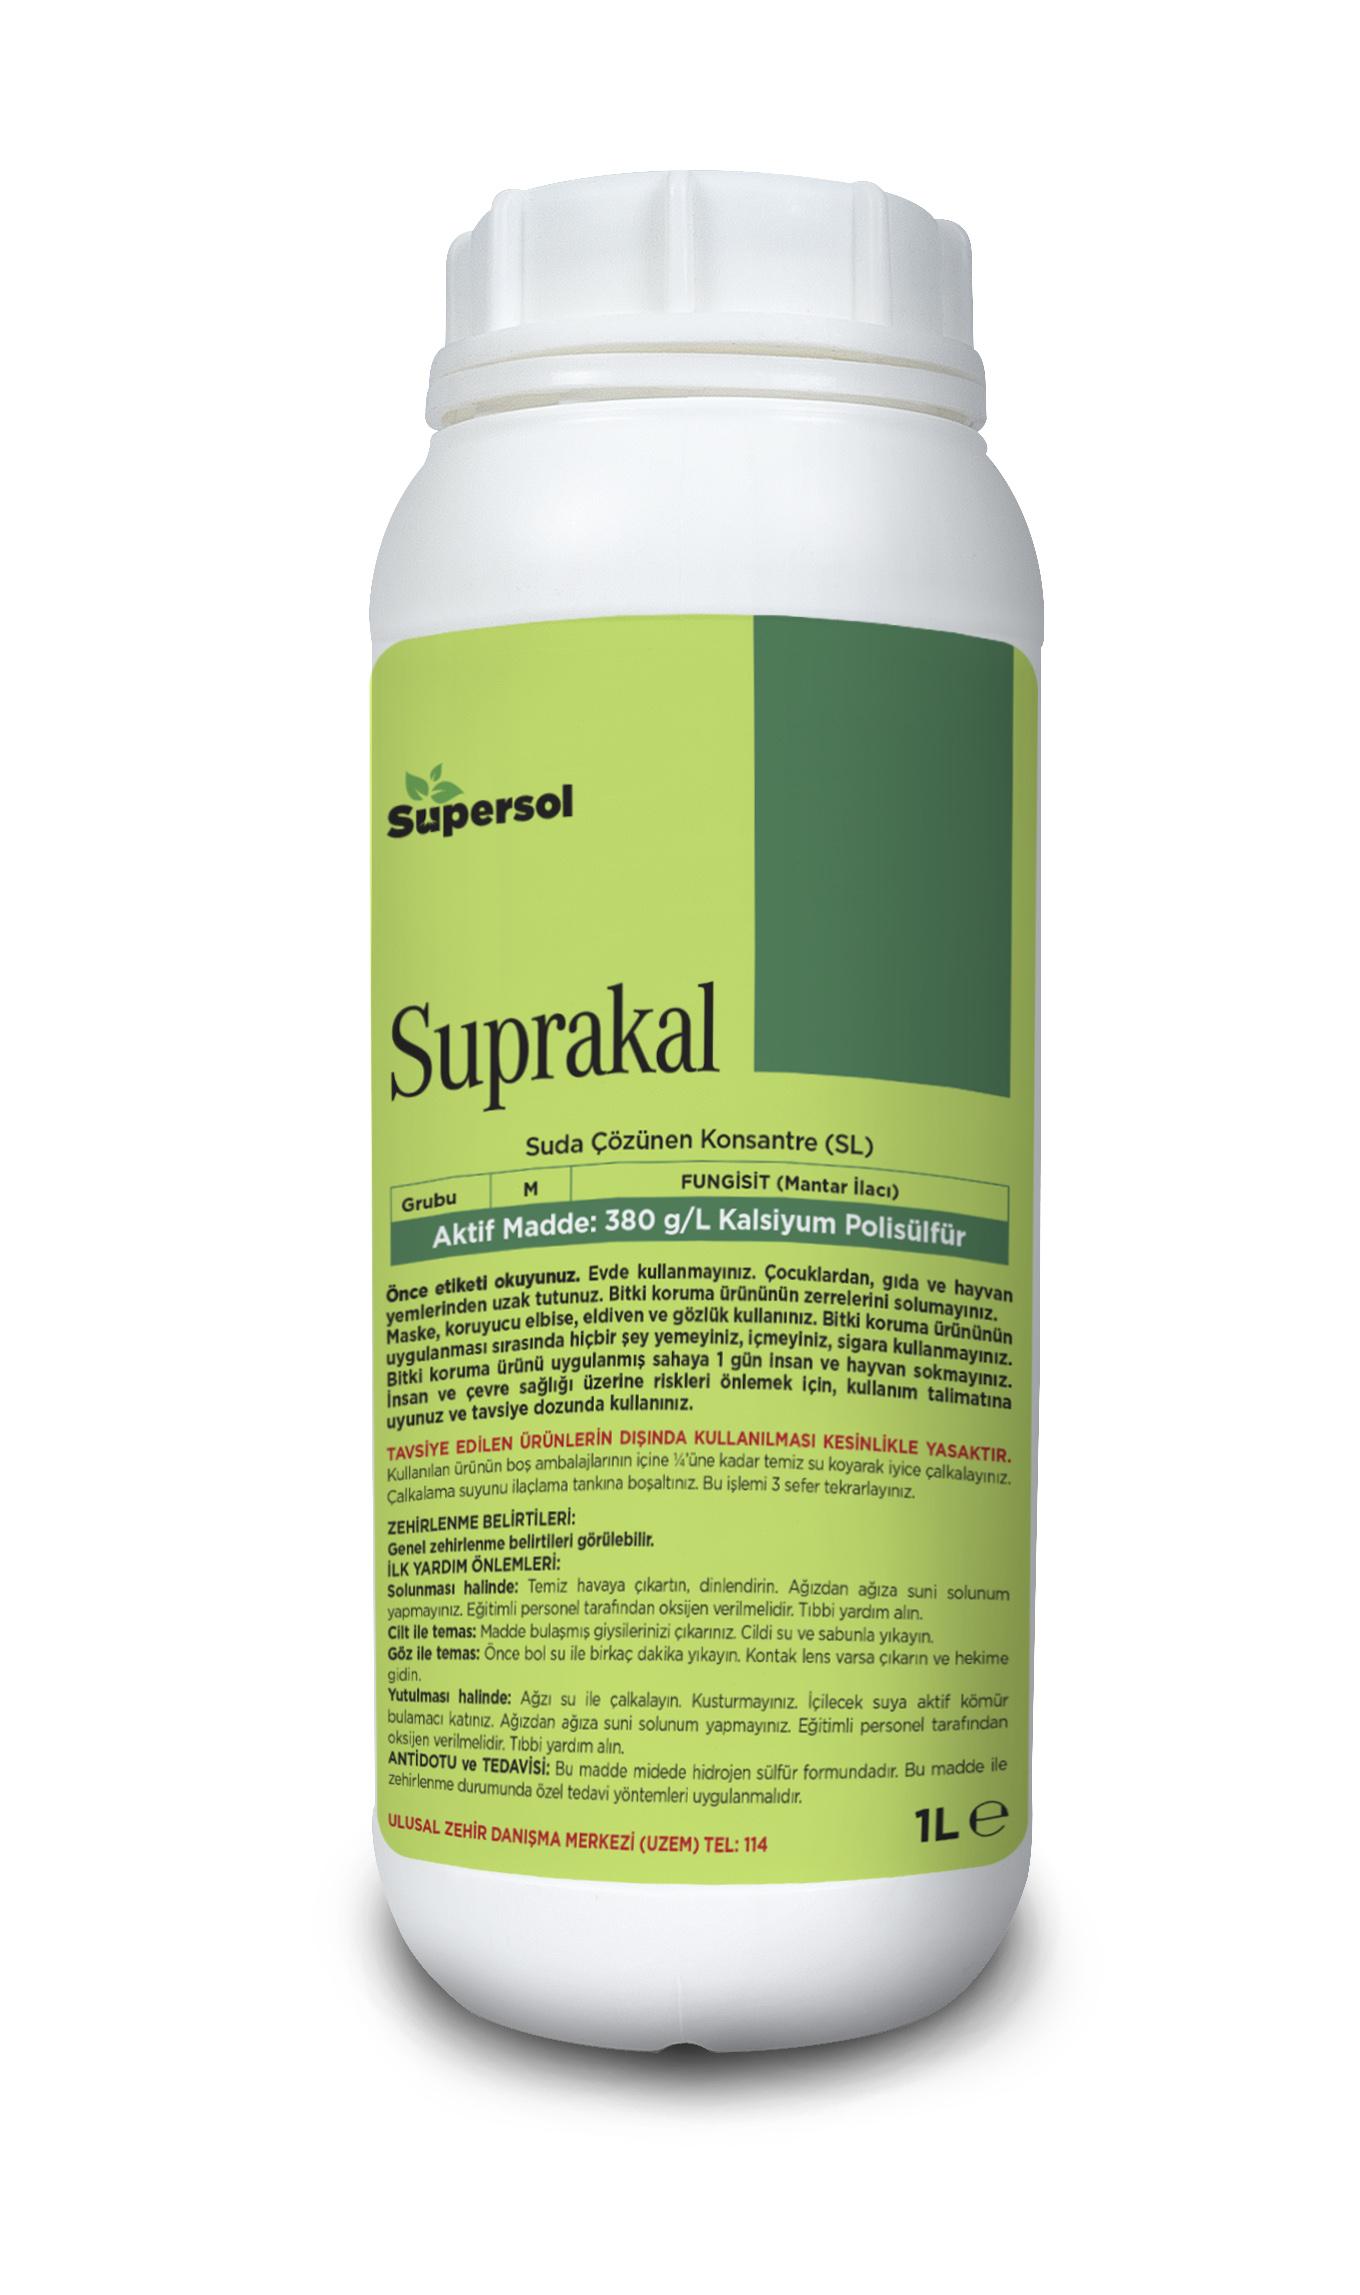 SUPRAKAL (Plant Protection)380 g/L Calcium polysulphide FUNGICIDE